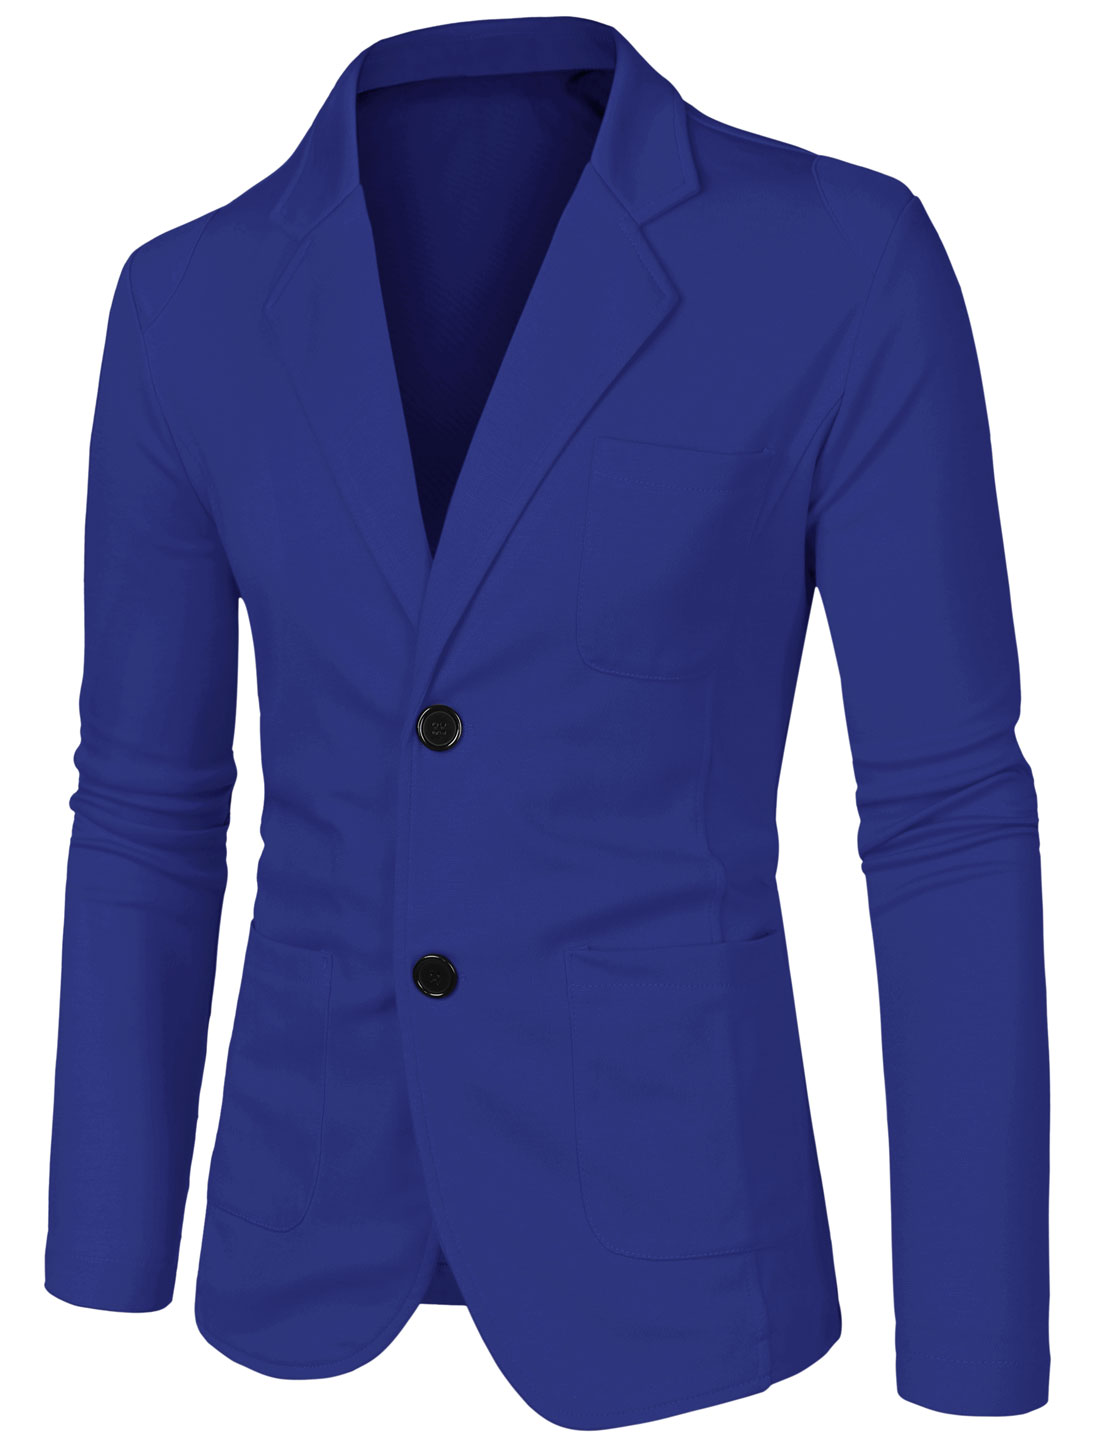 Men Notched Lapel Solid Color Long Sleeve Knit Blazer Royal Blue 38